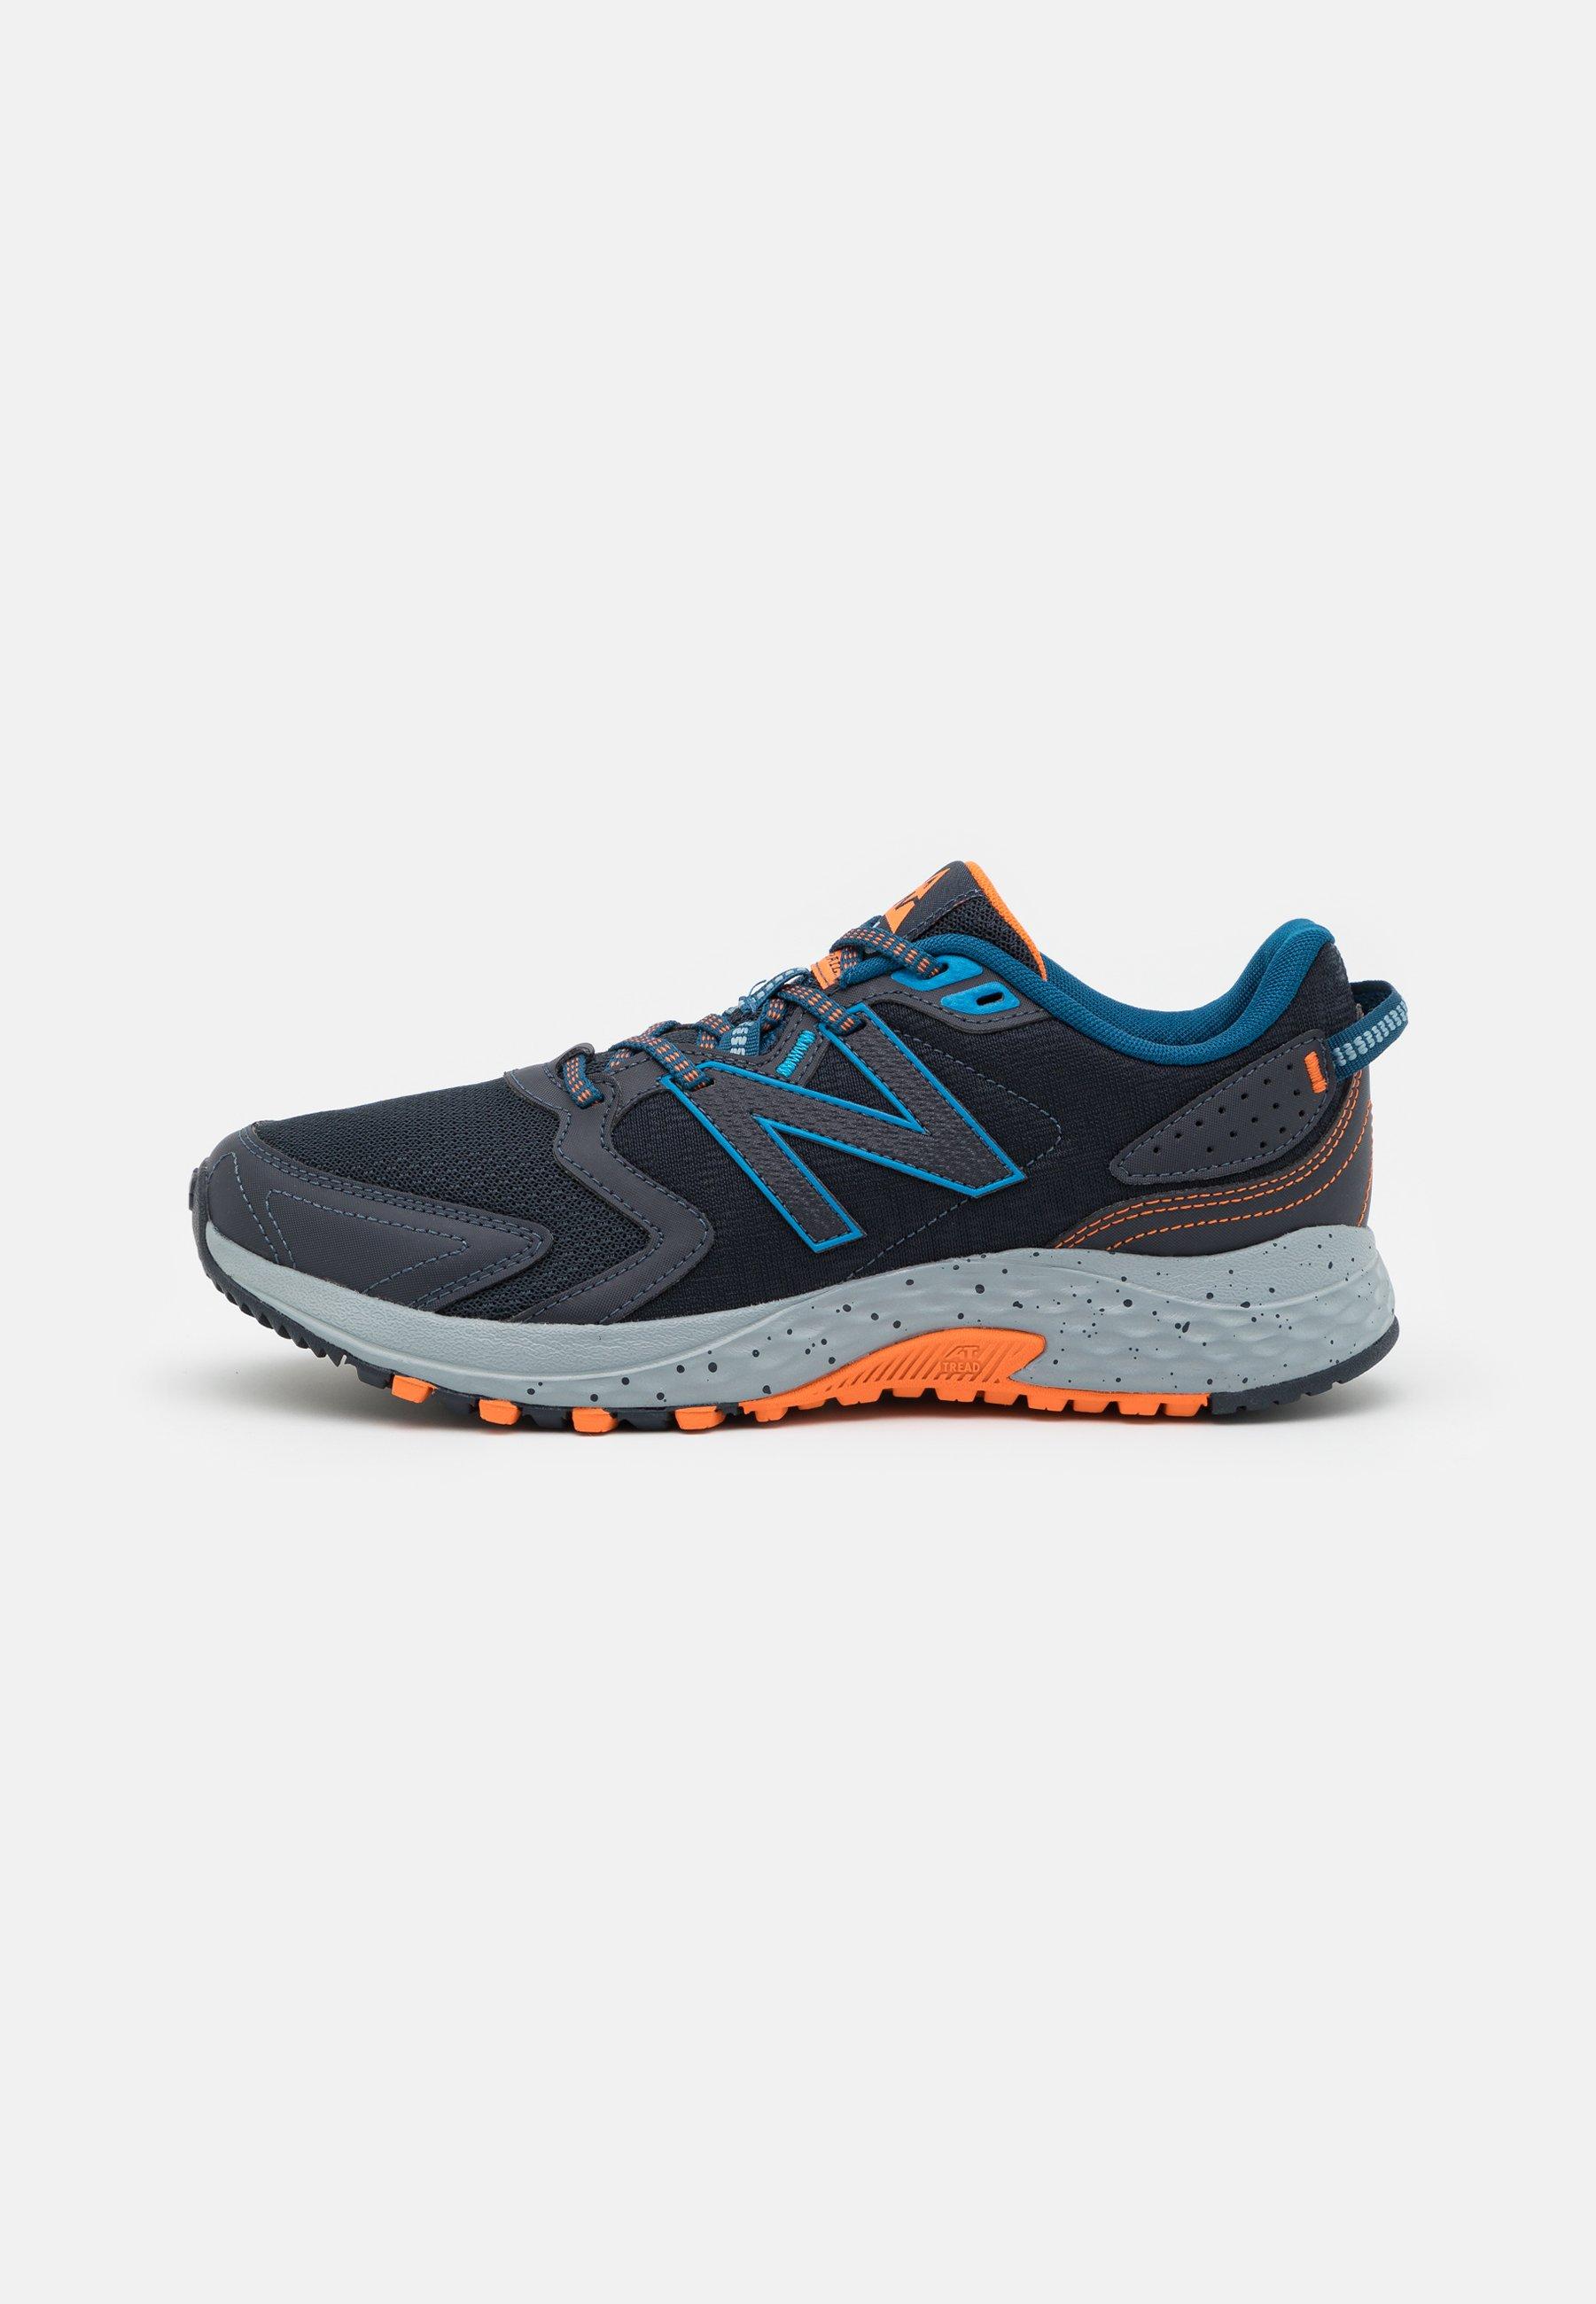 Men 410 - Trail running shoes